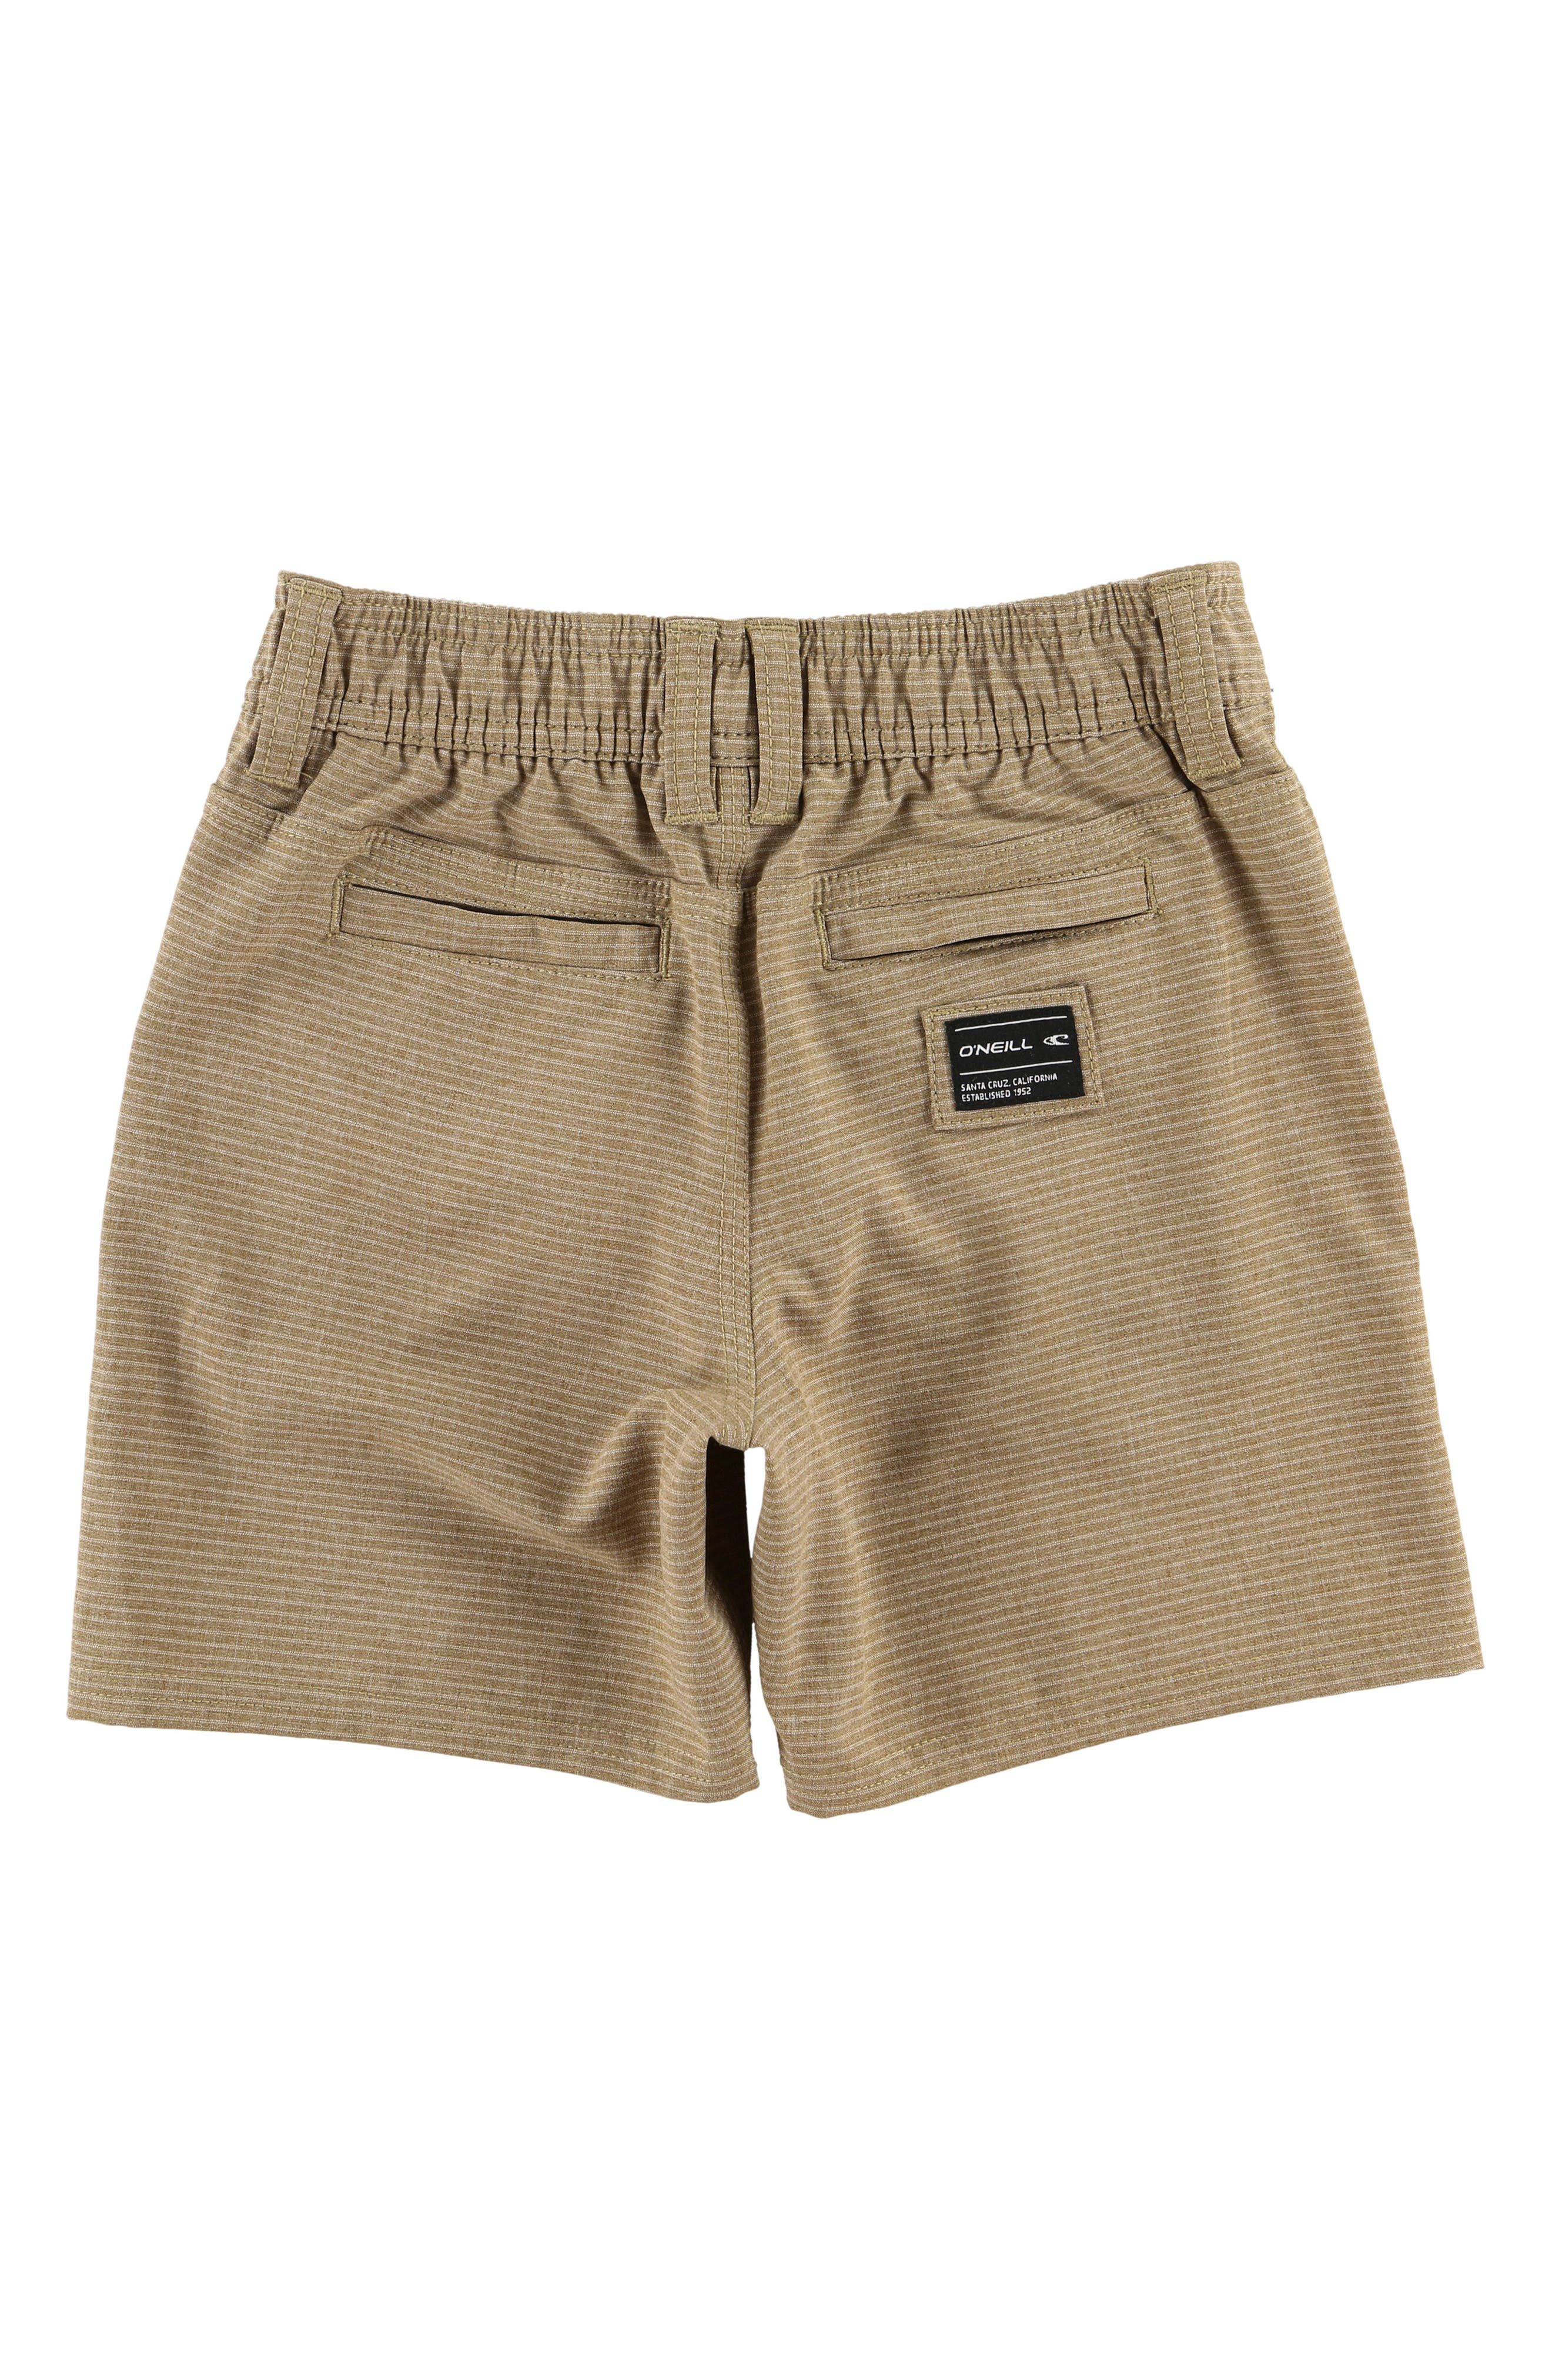 Locked Stripe Hybrid Shorts,                             Alternate thumbnail 2, color,                             205